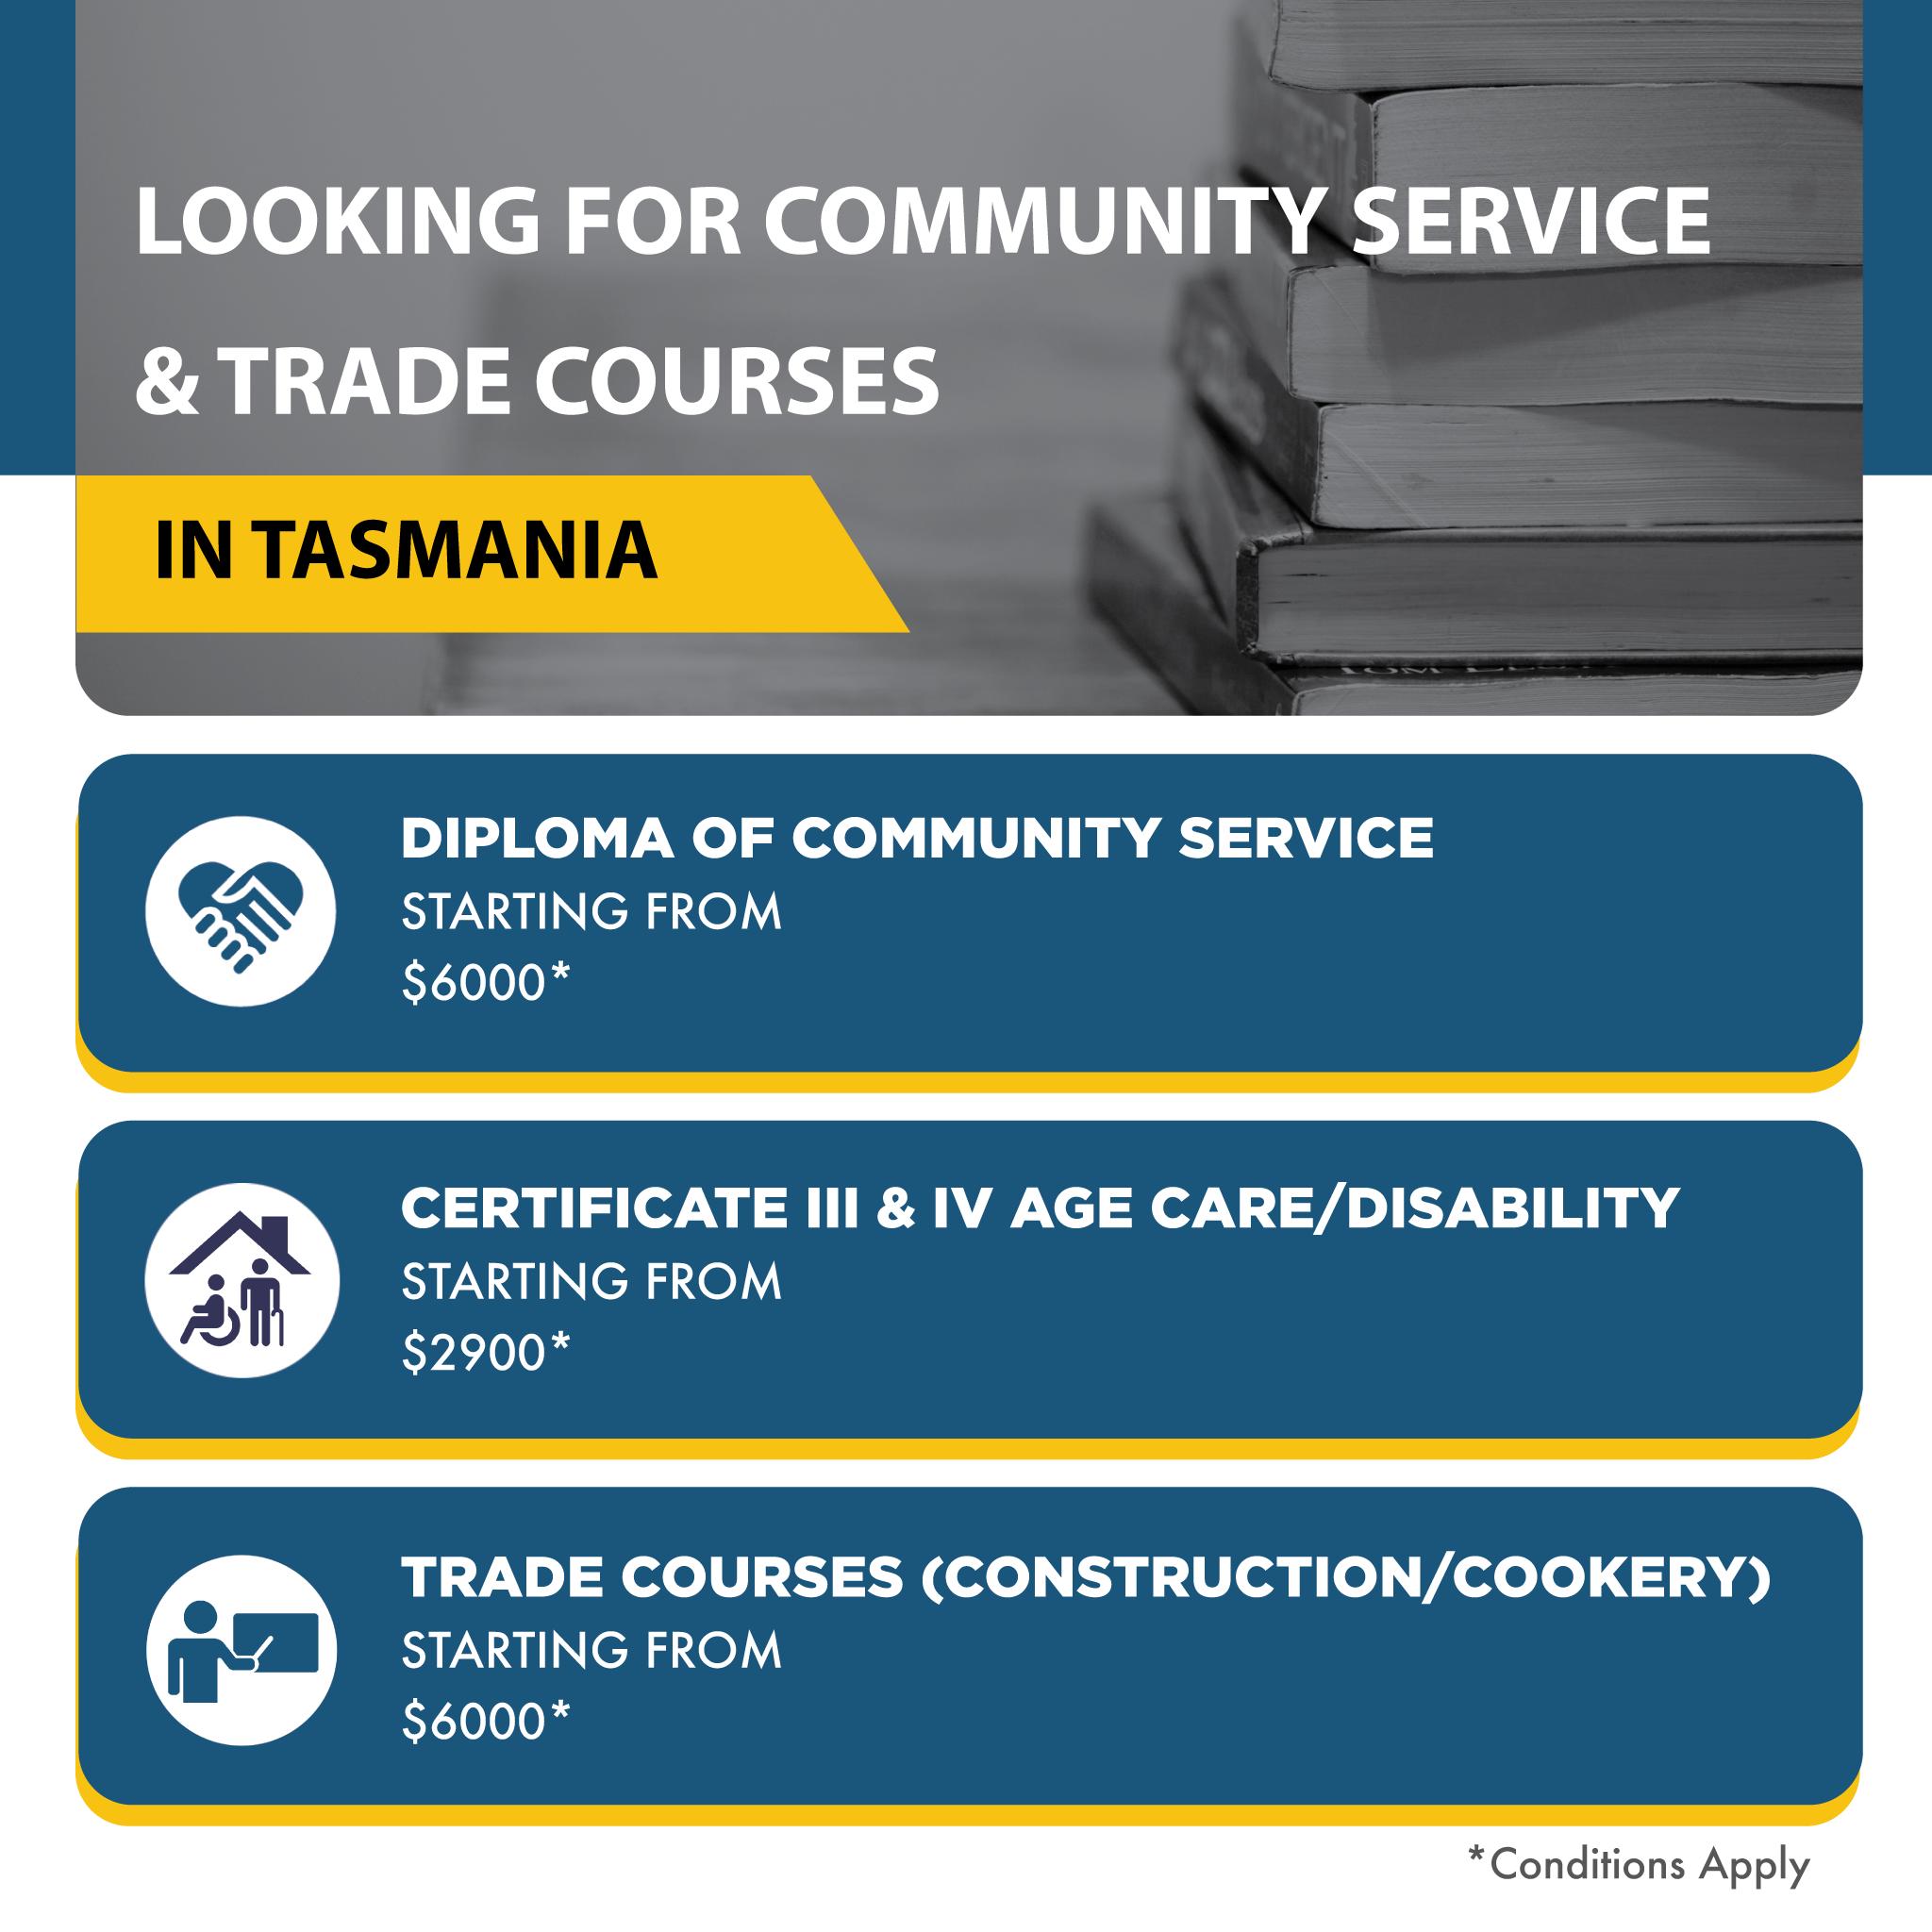 Trade Courses in Tasmania